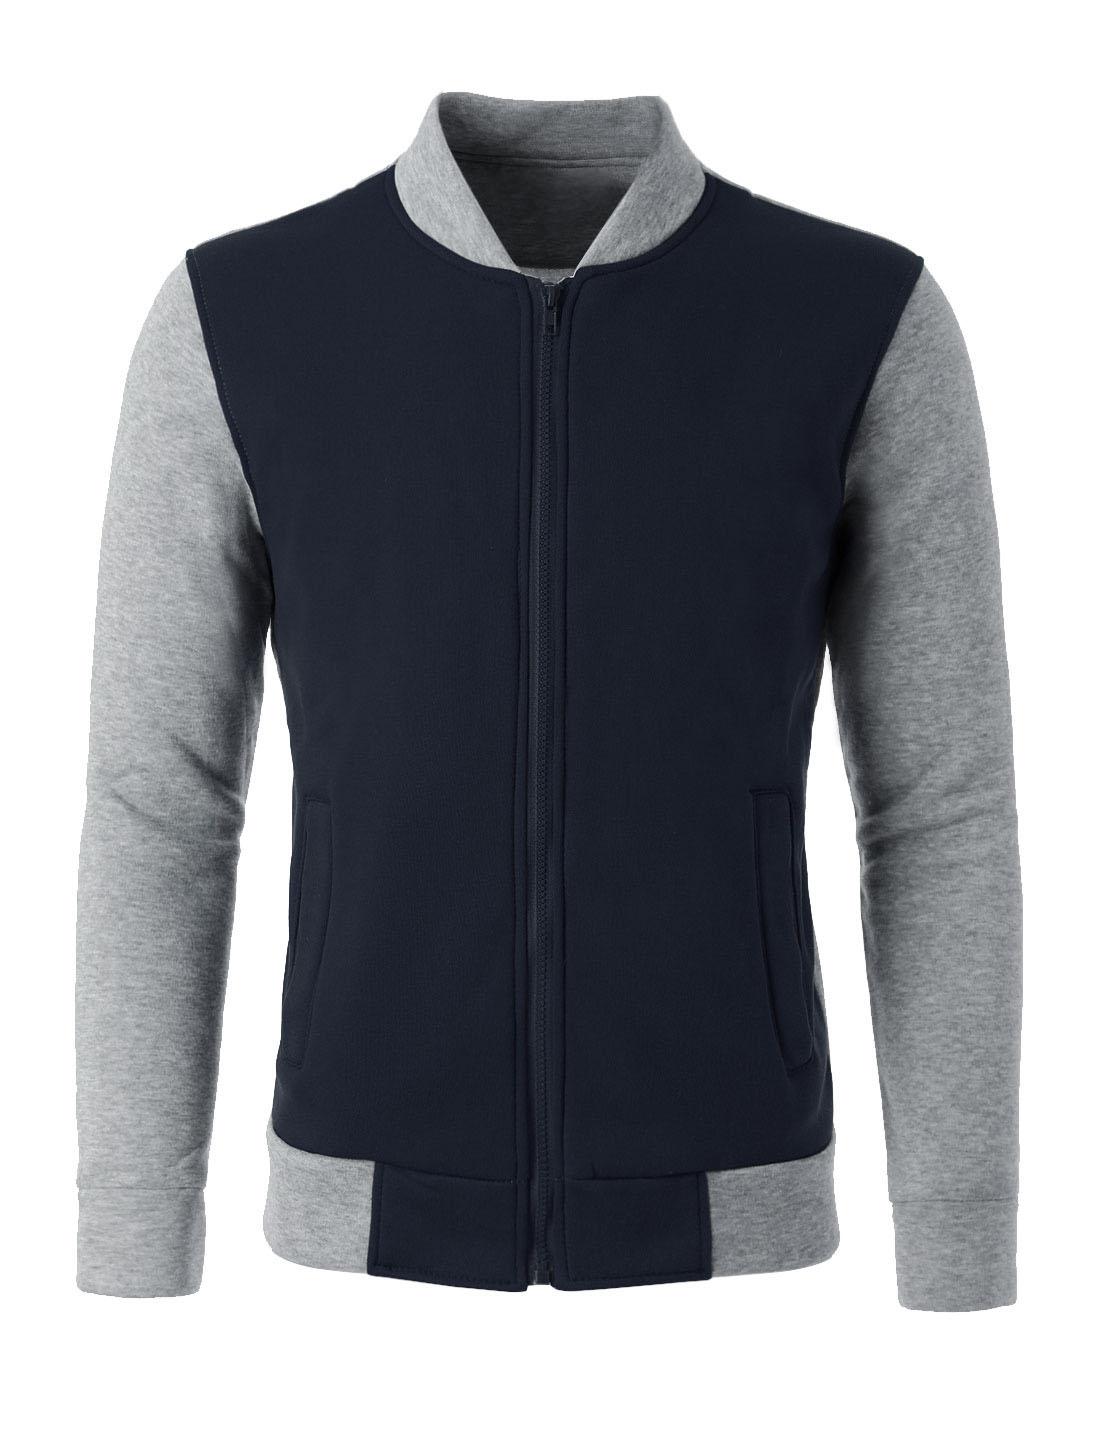 Men Zip Closure Collared Contrast Color Varsity Jacket Navy Blue Gray S